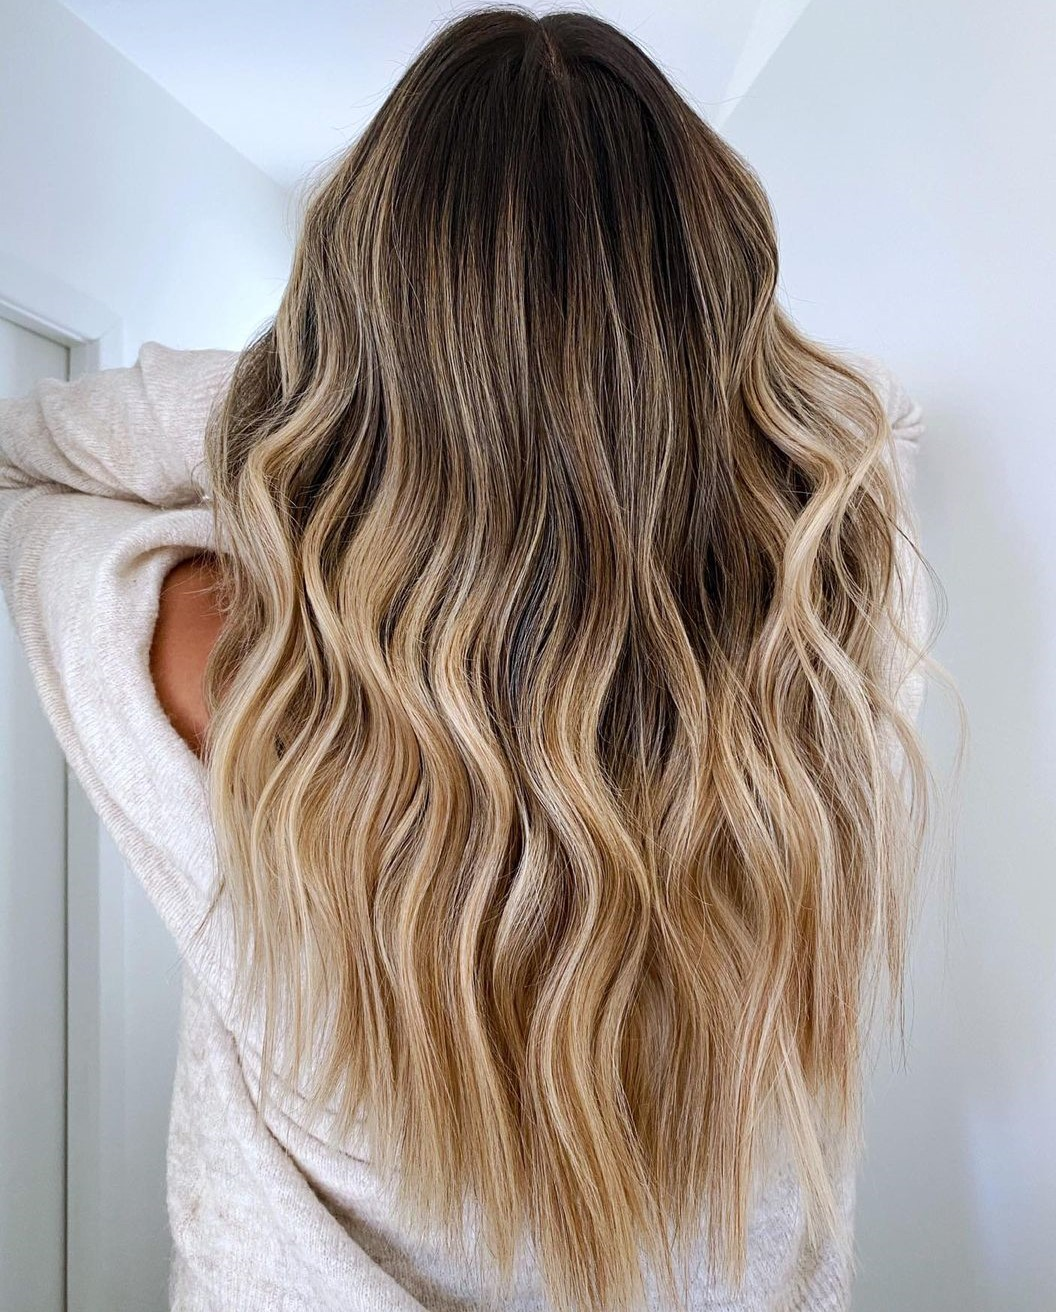 Beige Blonde Hair with Honey Highlights